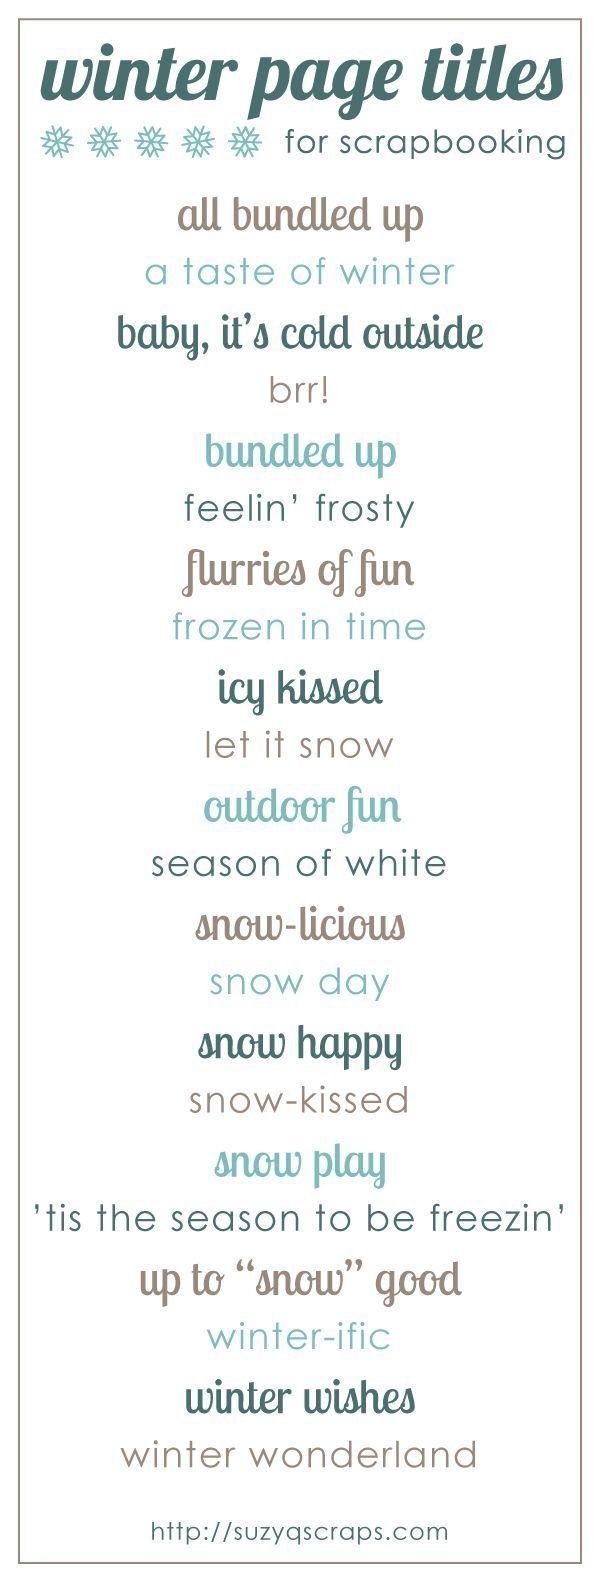 Winter scrapbook page titles by kari